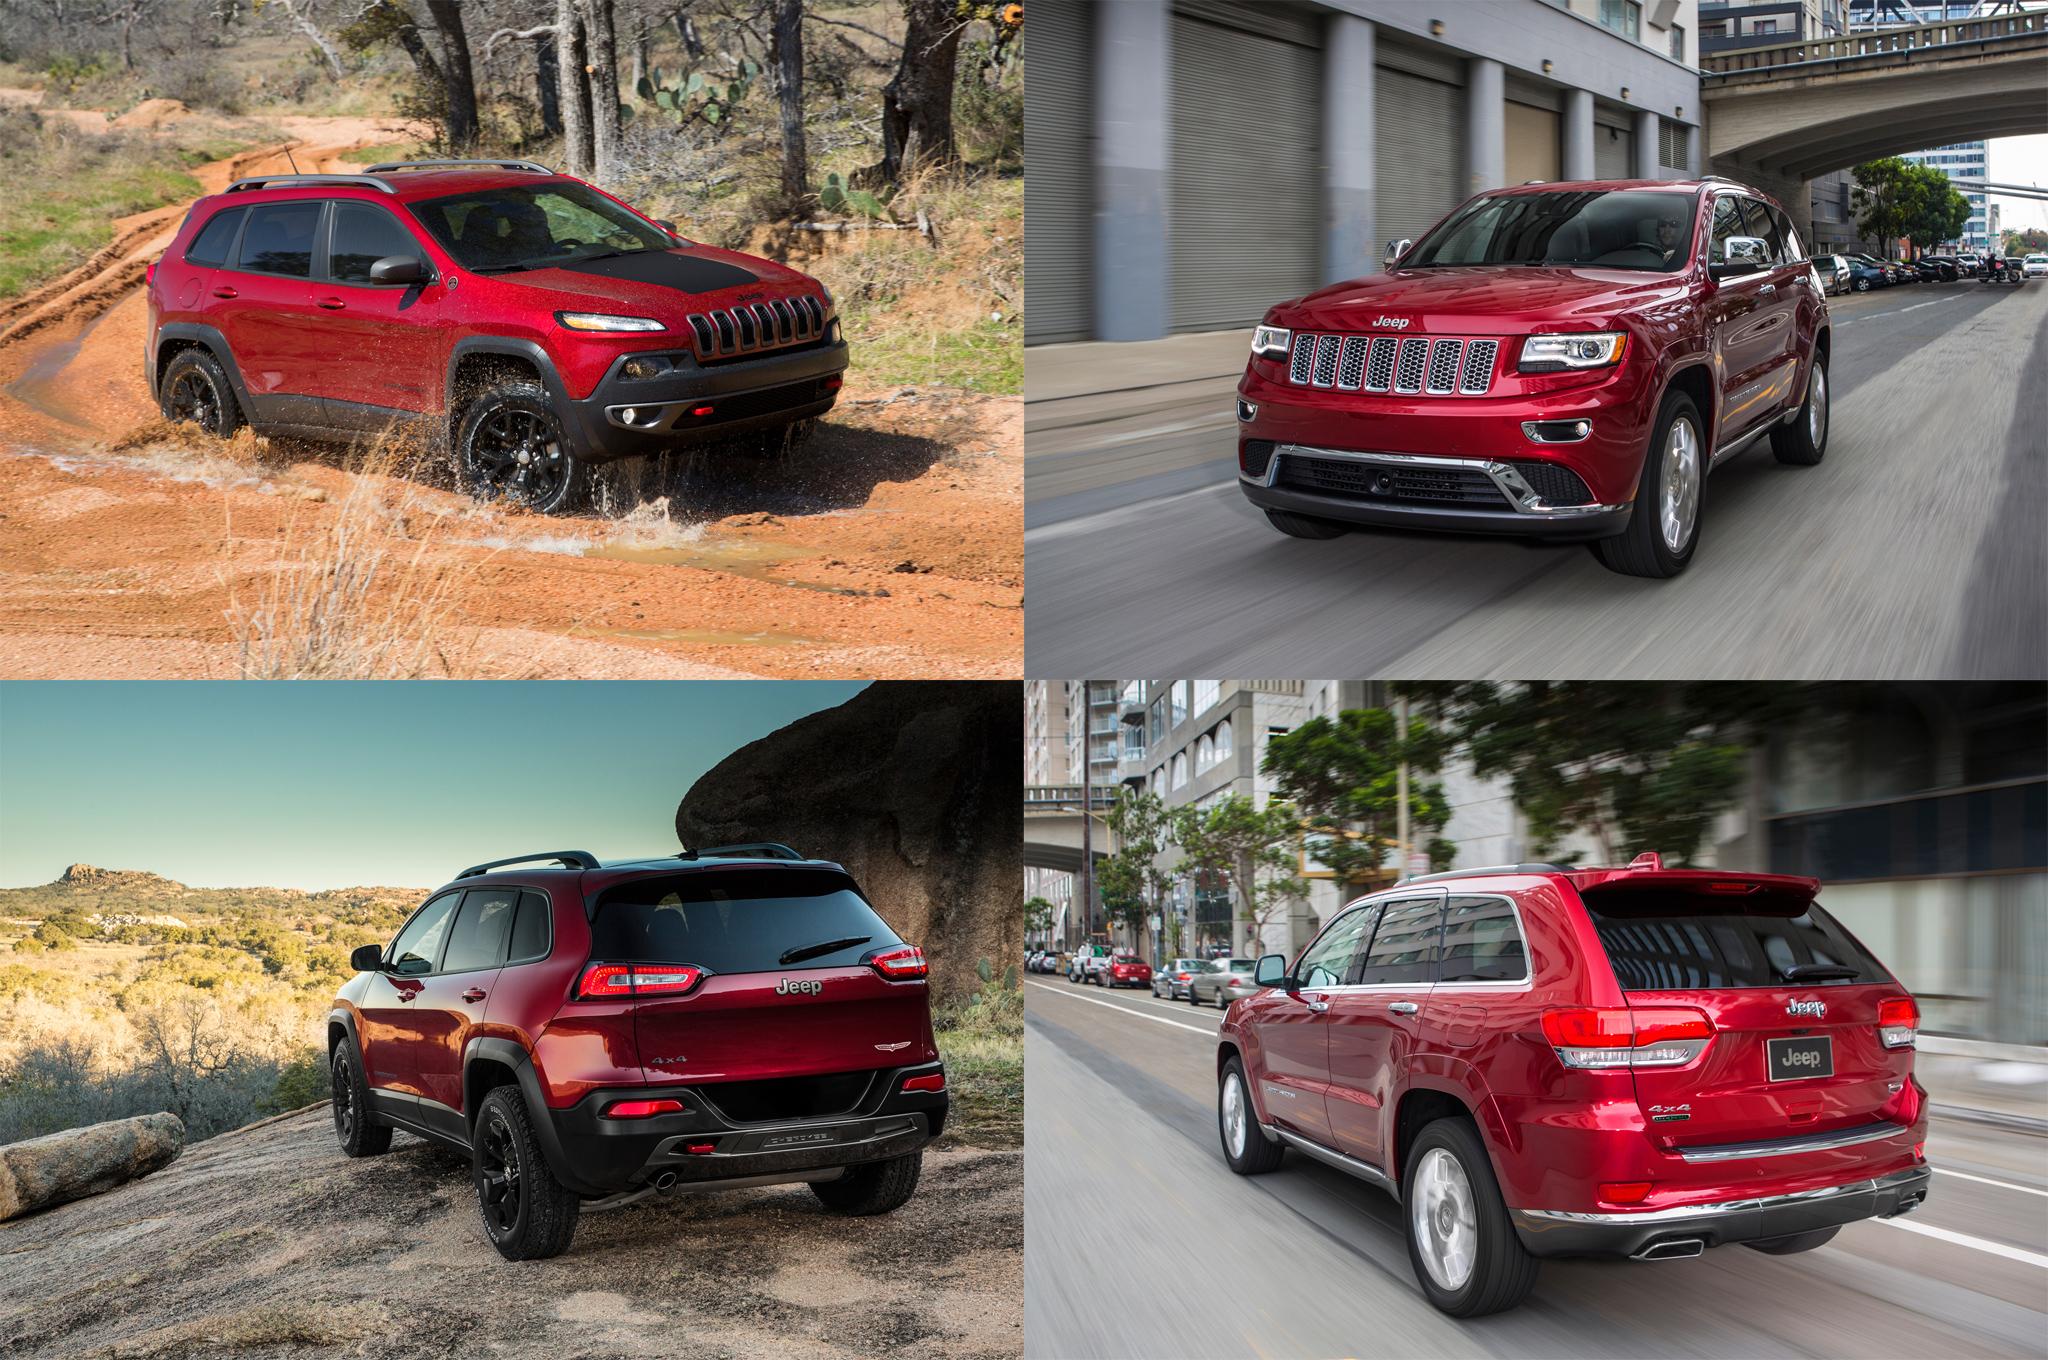 2014-jeep-cherokee-limited-or-2014-jeep-grand-cherokee